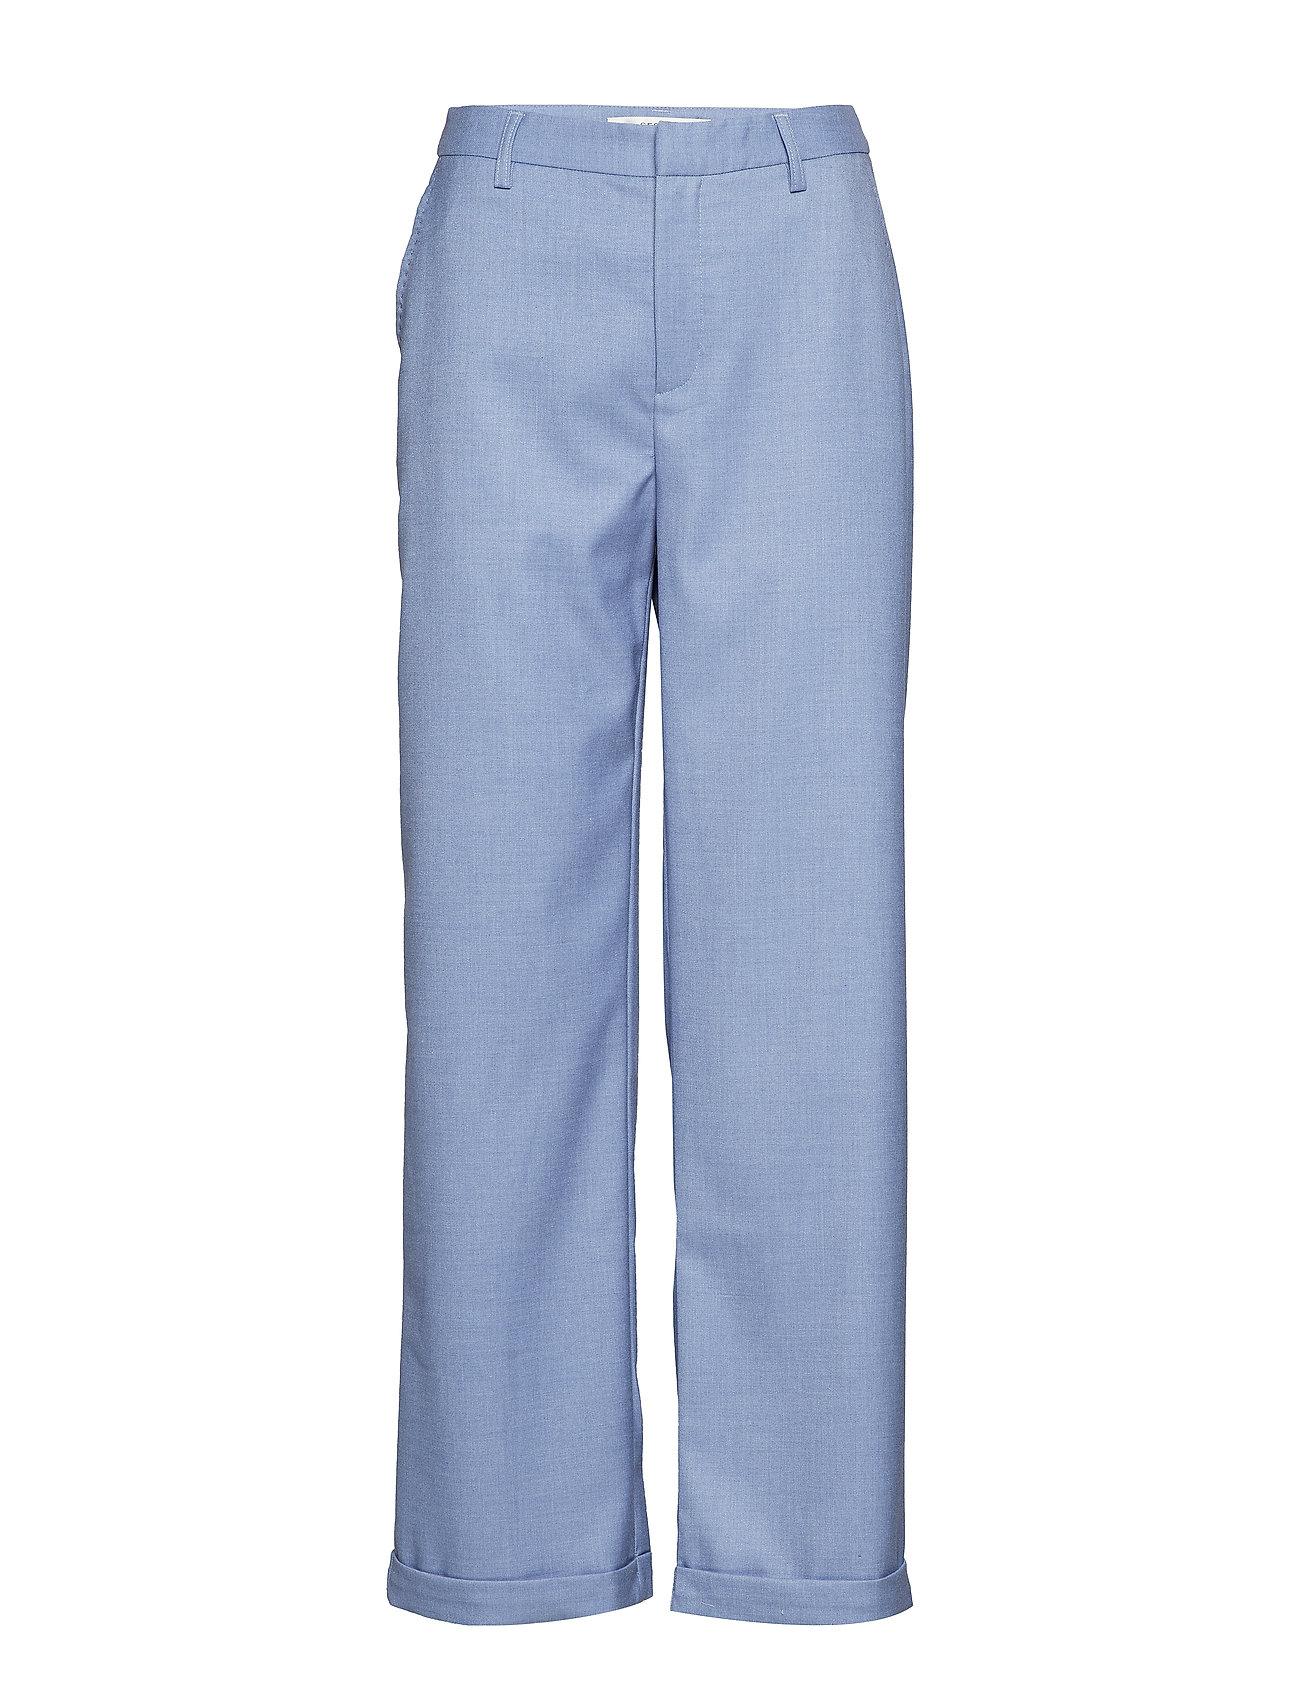 Gestuz Natima pants MS19 - LIGHT BLUE